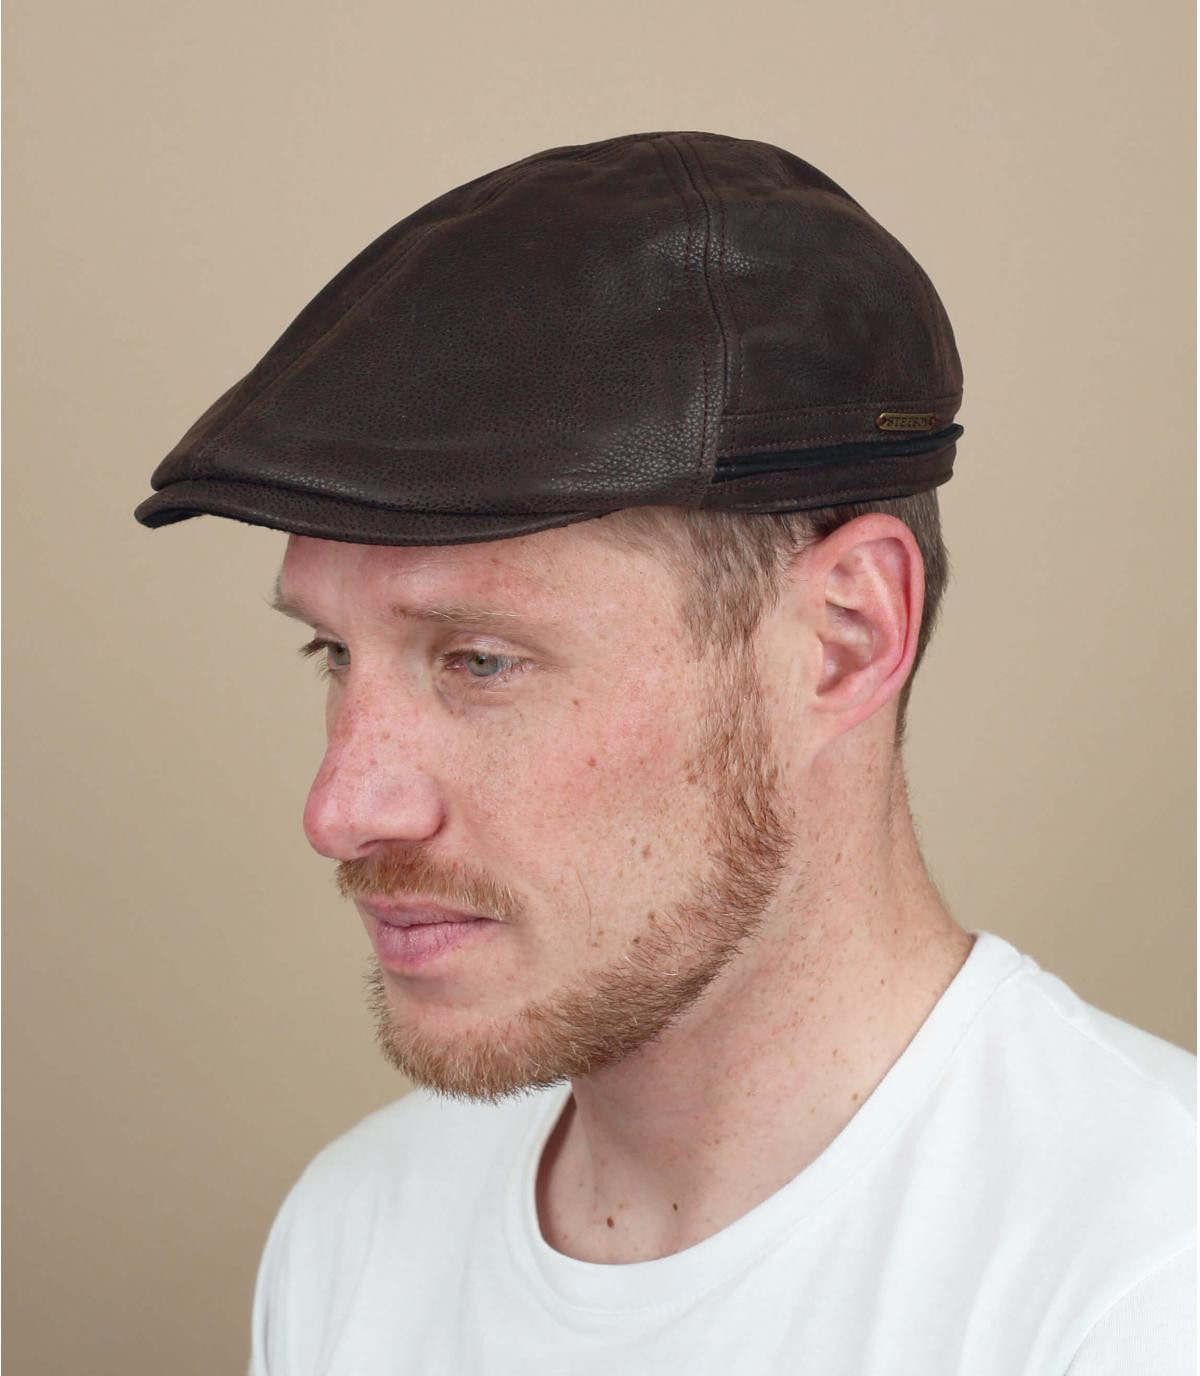 c49edf0556e Buy men ivy cap - Online ivy caps shop